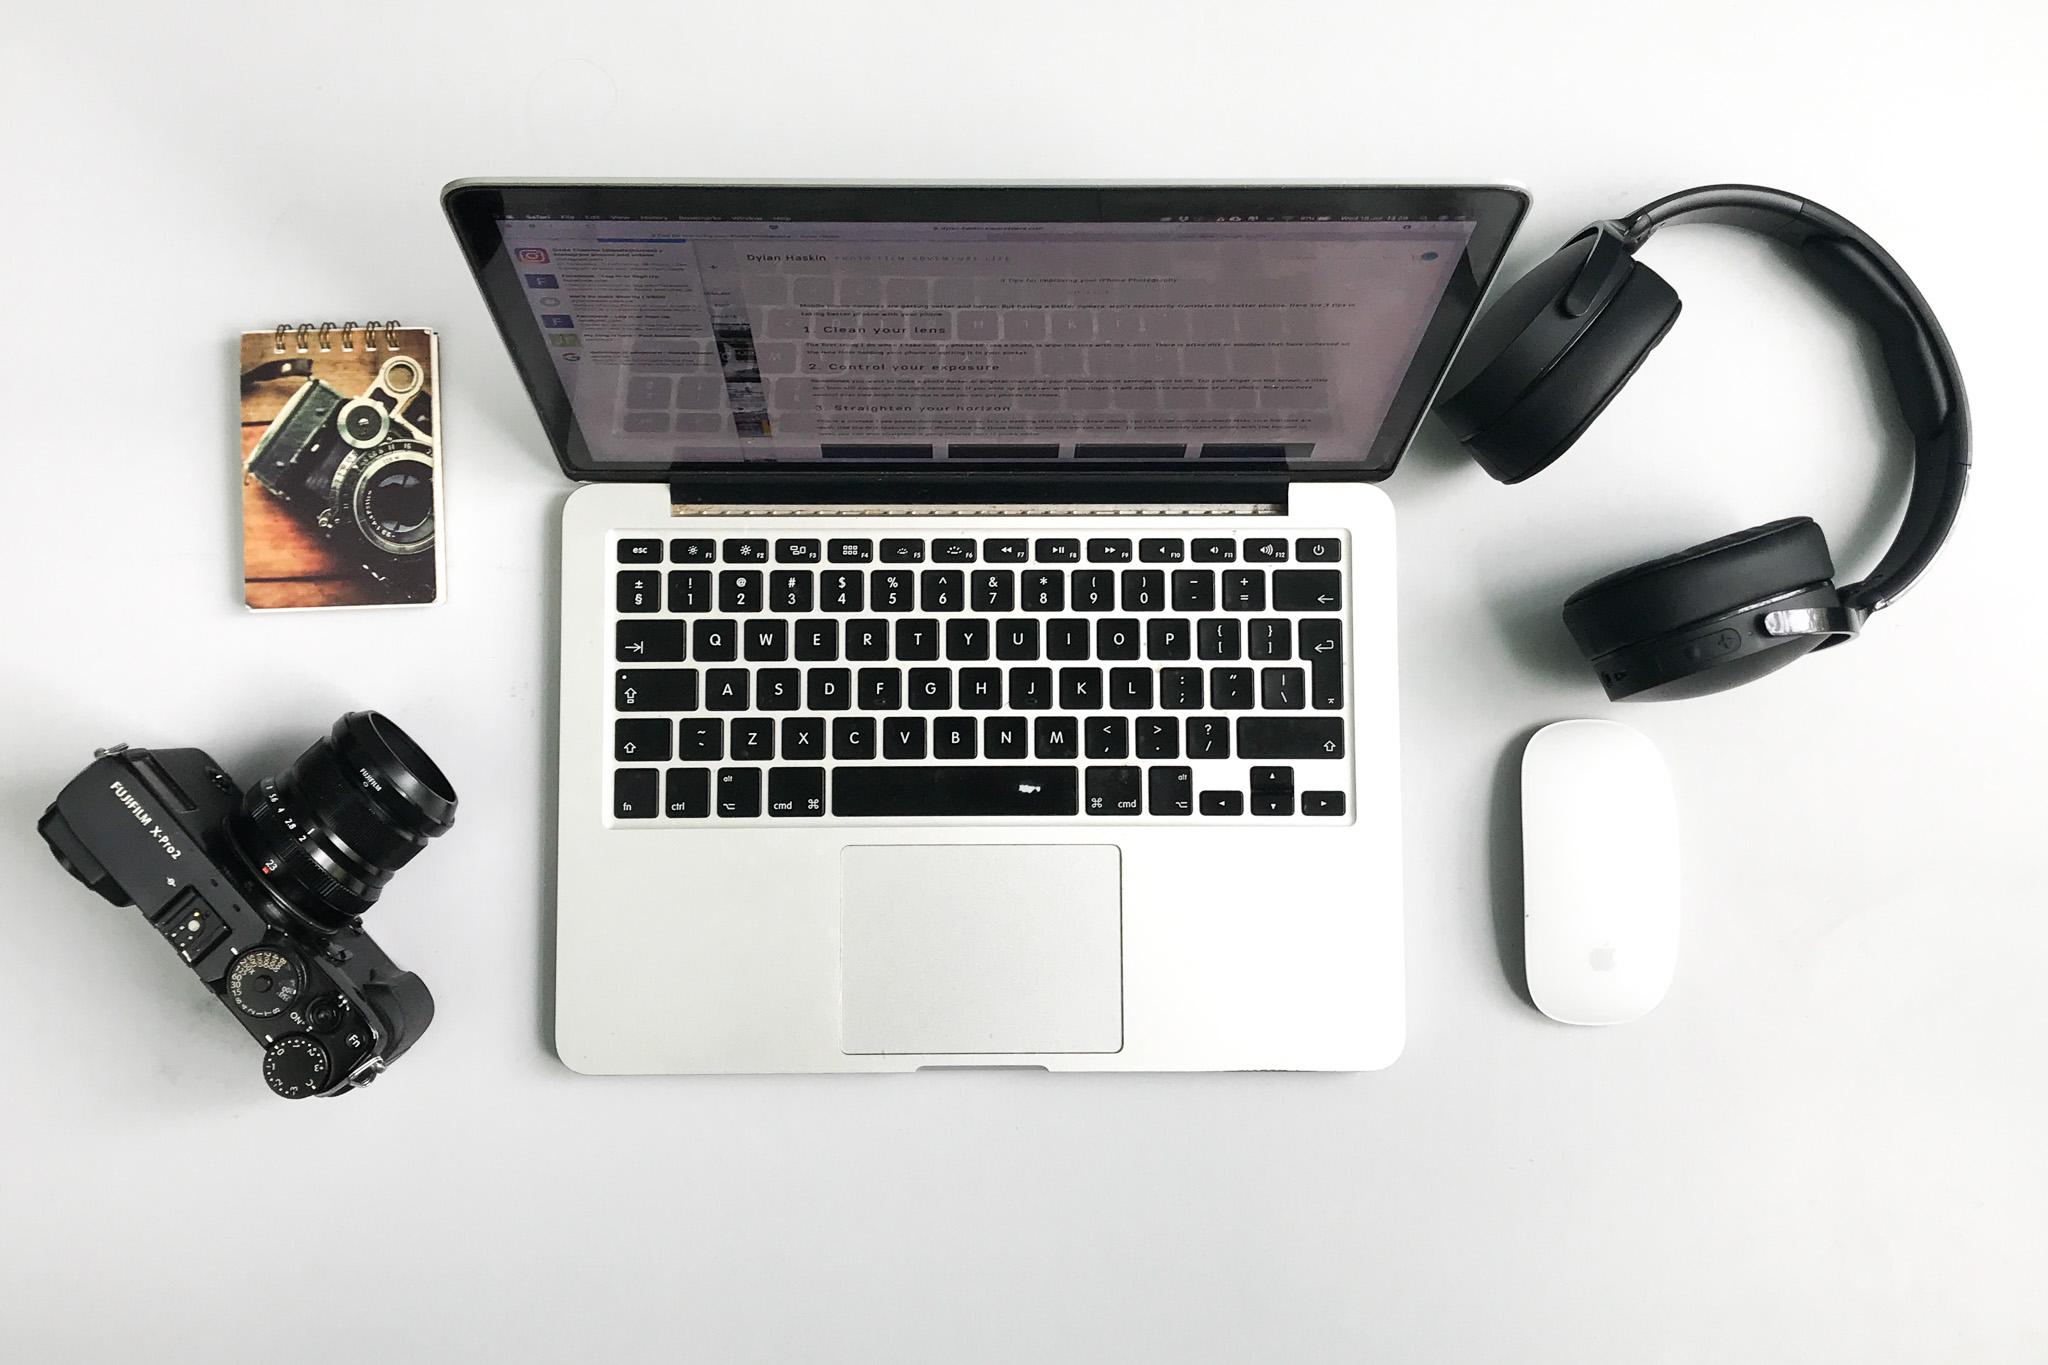 Macbook pro flatlay